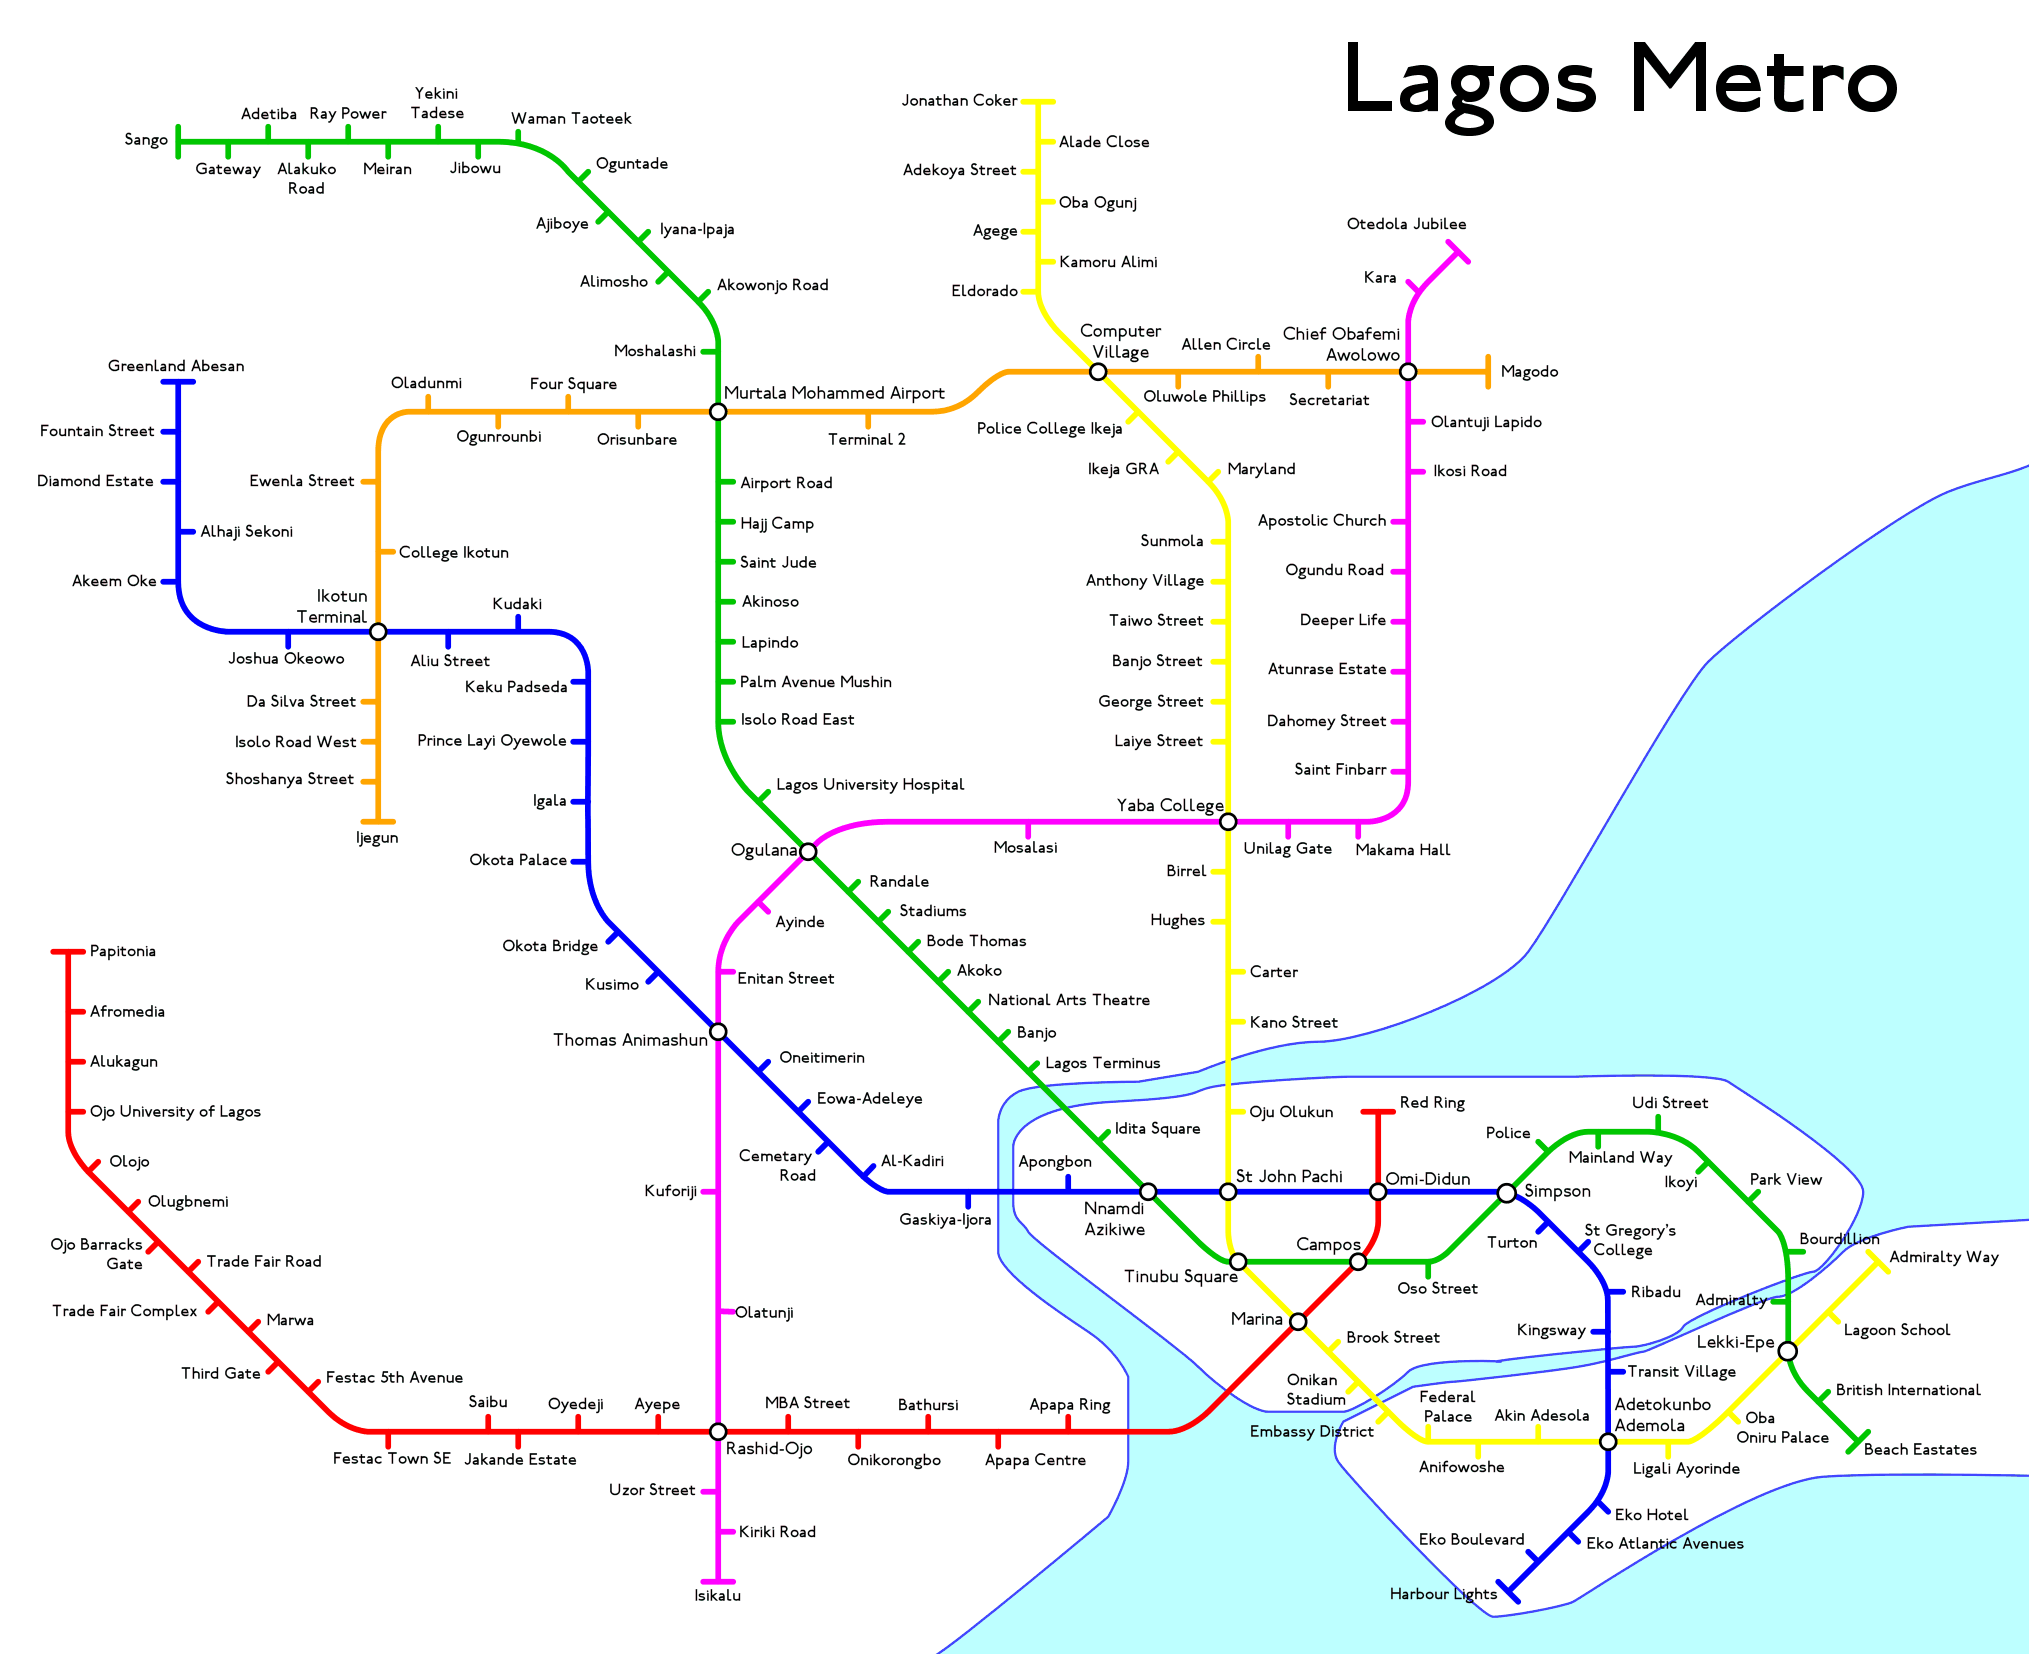 Lagos Nigeria Fantasy Metro Rail System Map By JohnQMetro From